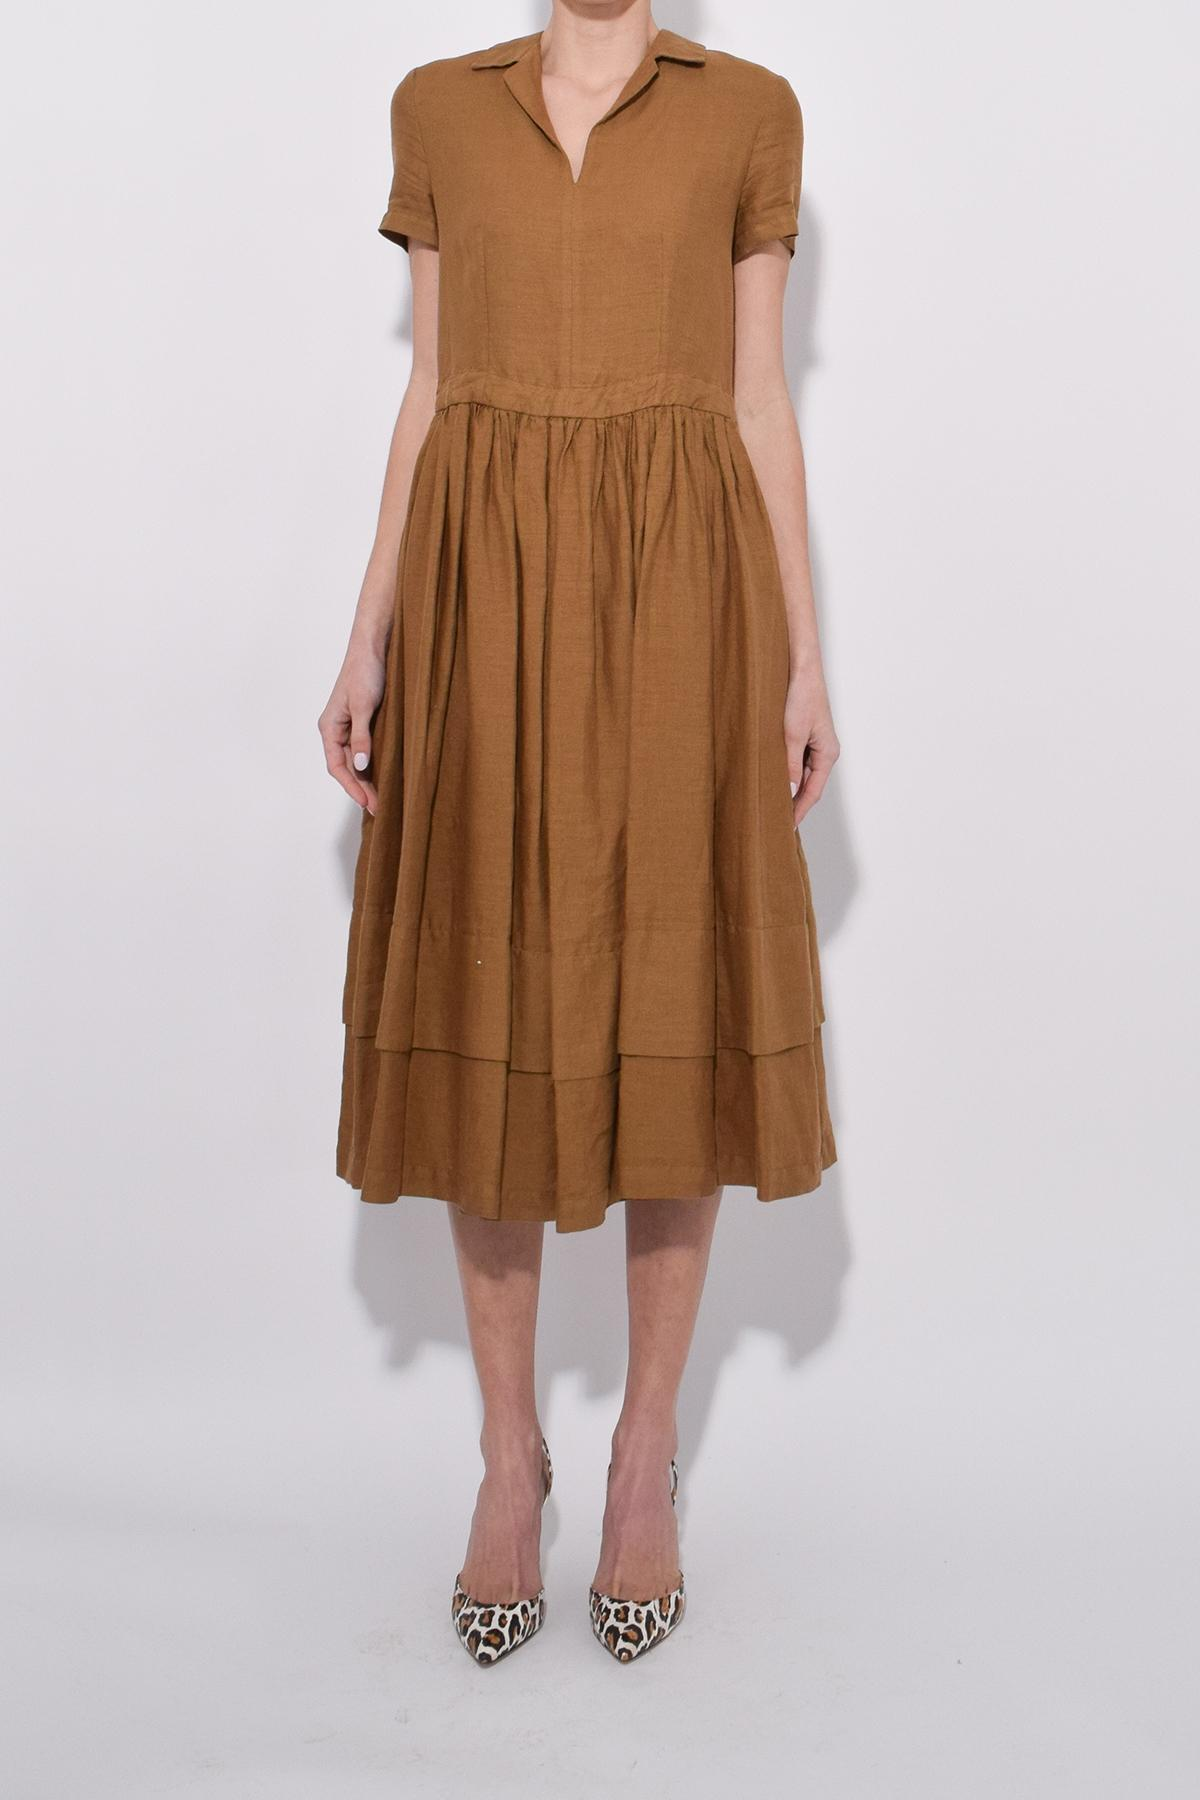 ad23537c518 Aspesi - Brown Short Sleeve Linen Dress In Tobacco - Lyst. View fullscreen